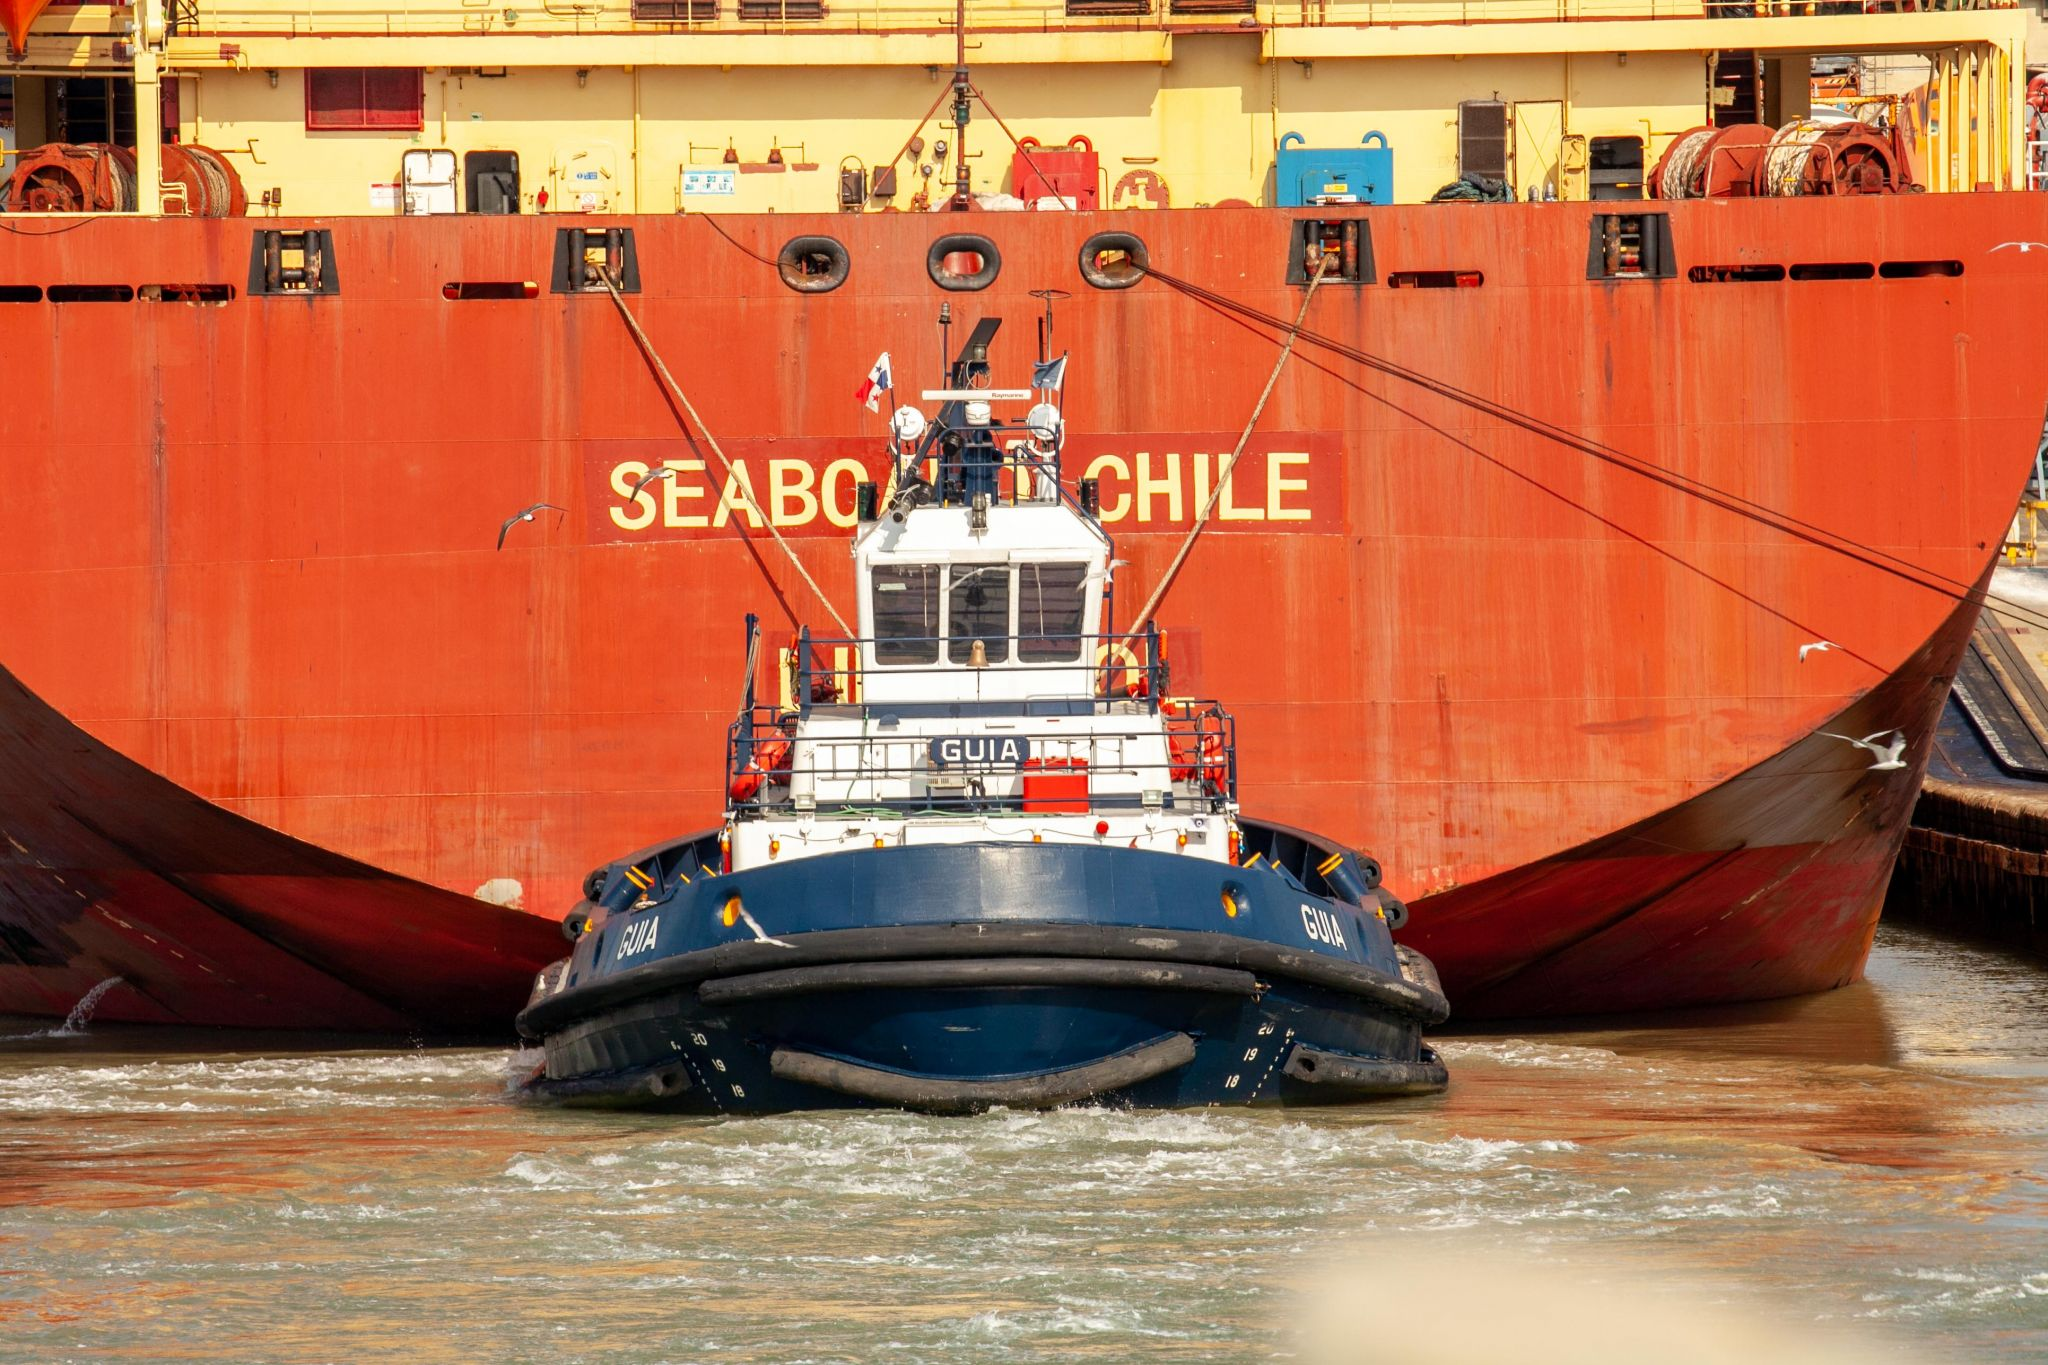 Tug Boat assisting a ship Panama Canal, Panama